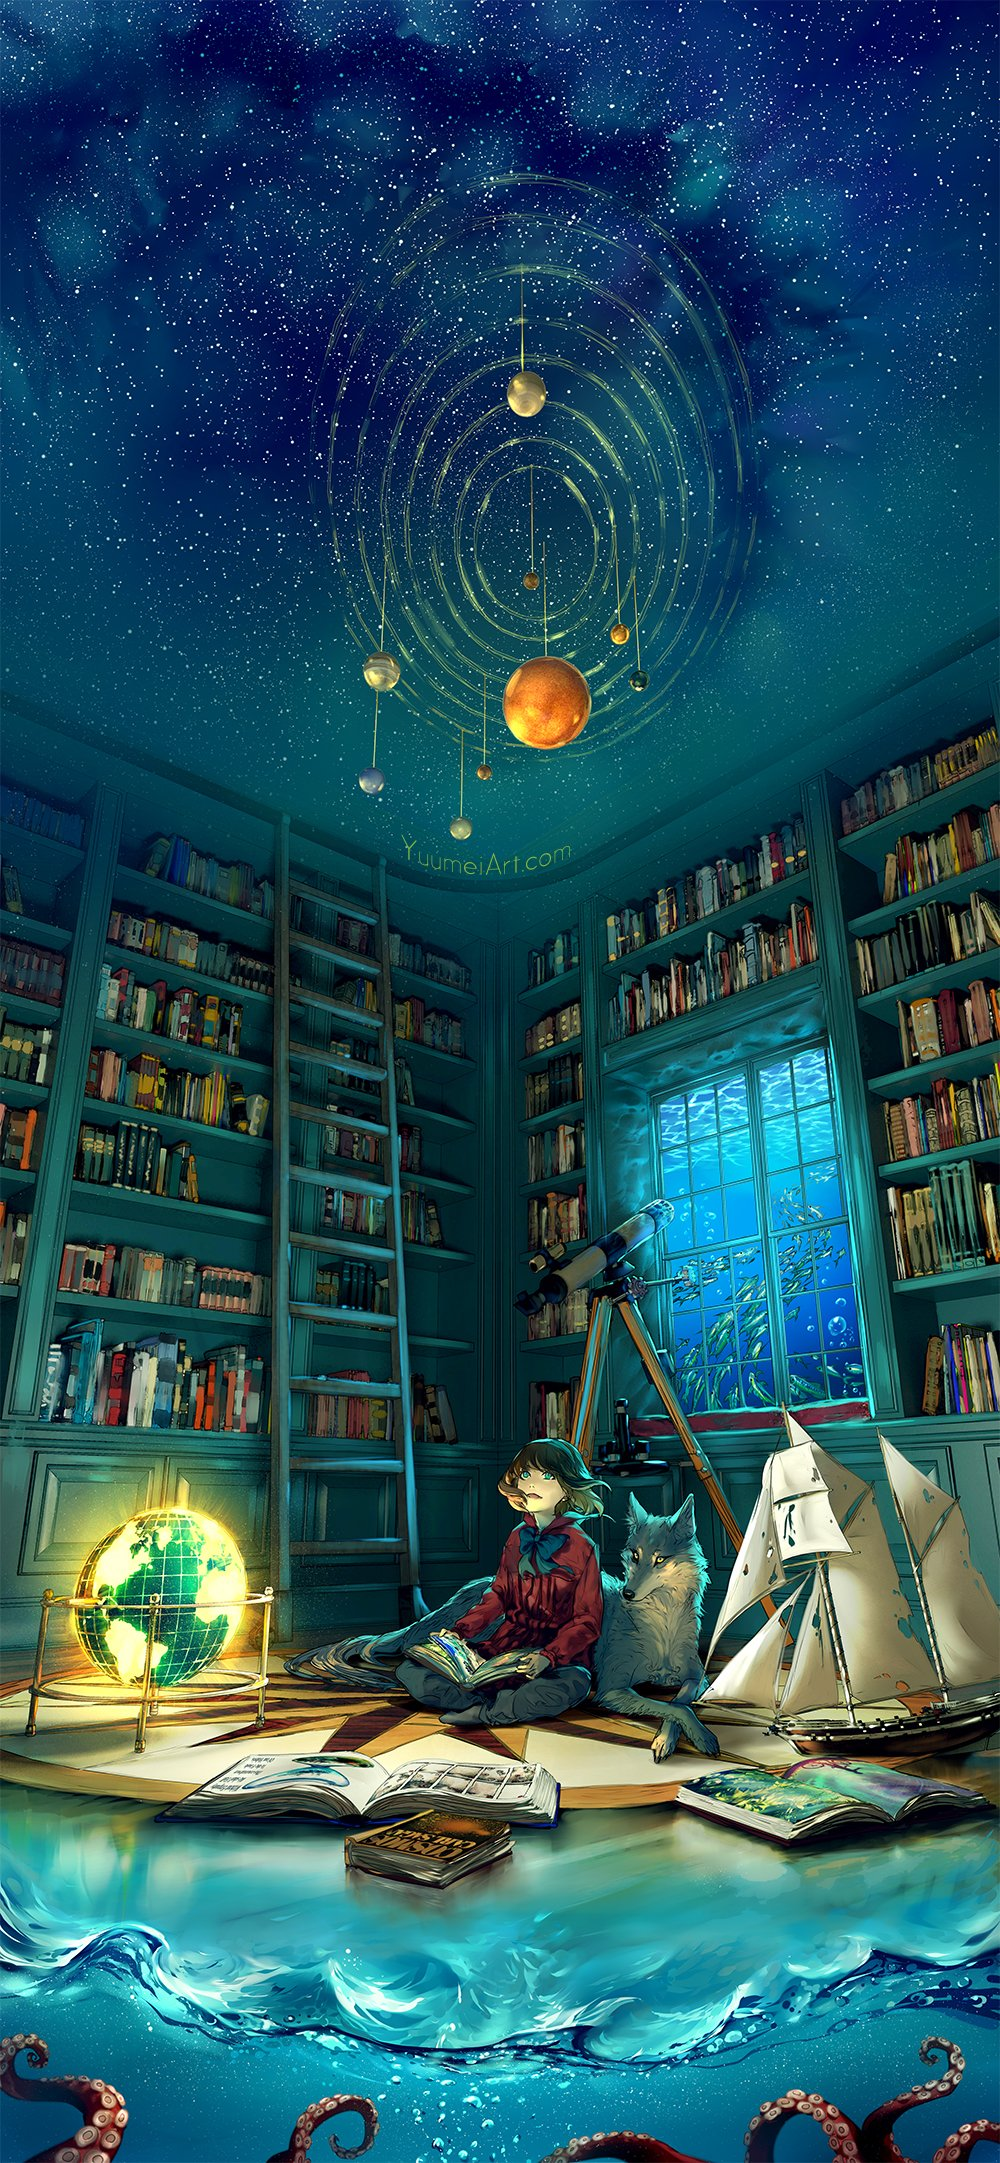 Art Yuumei и ее легкий сюрреализм - Изображение 9